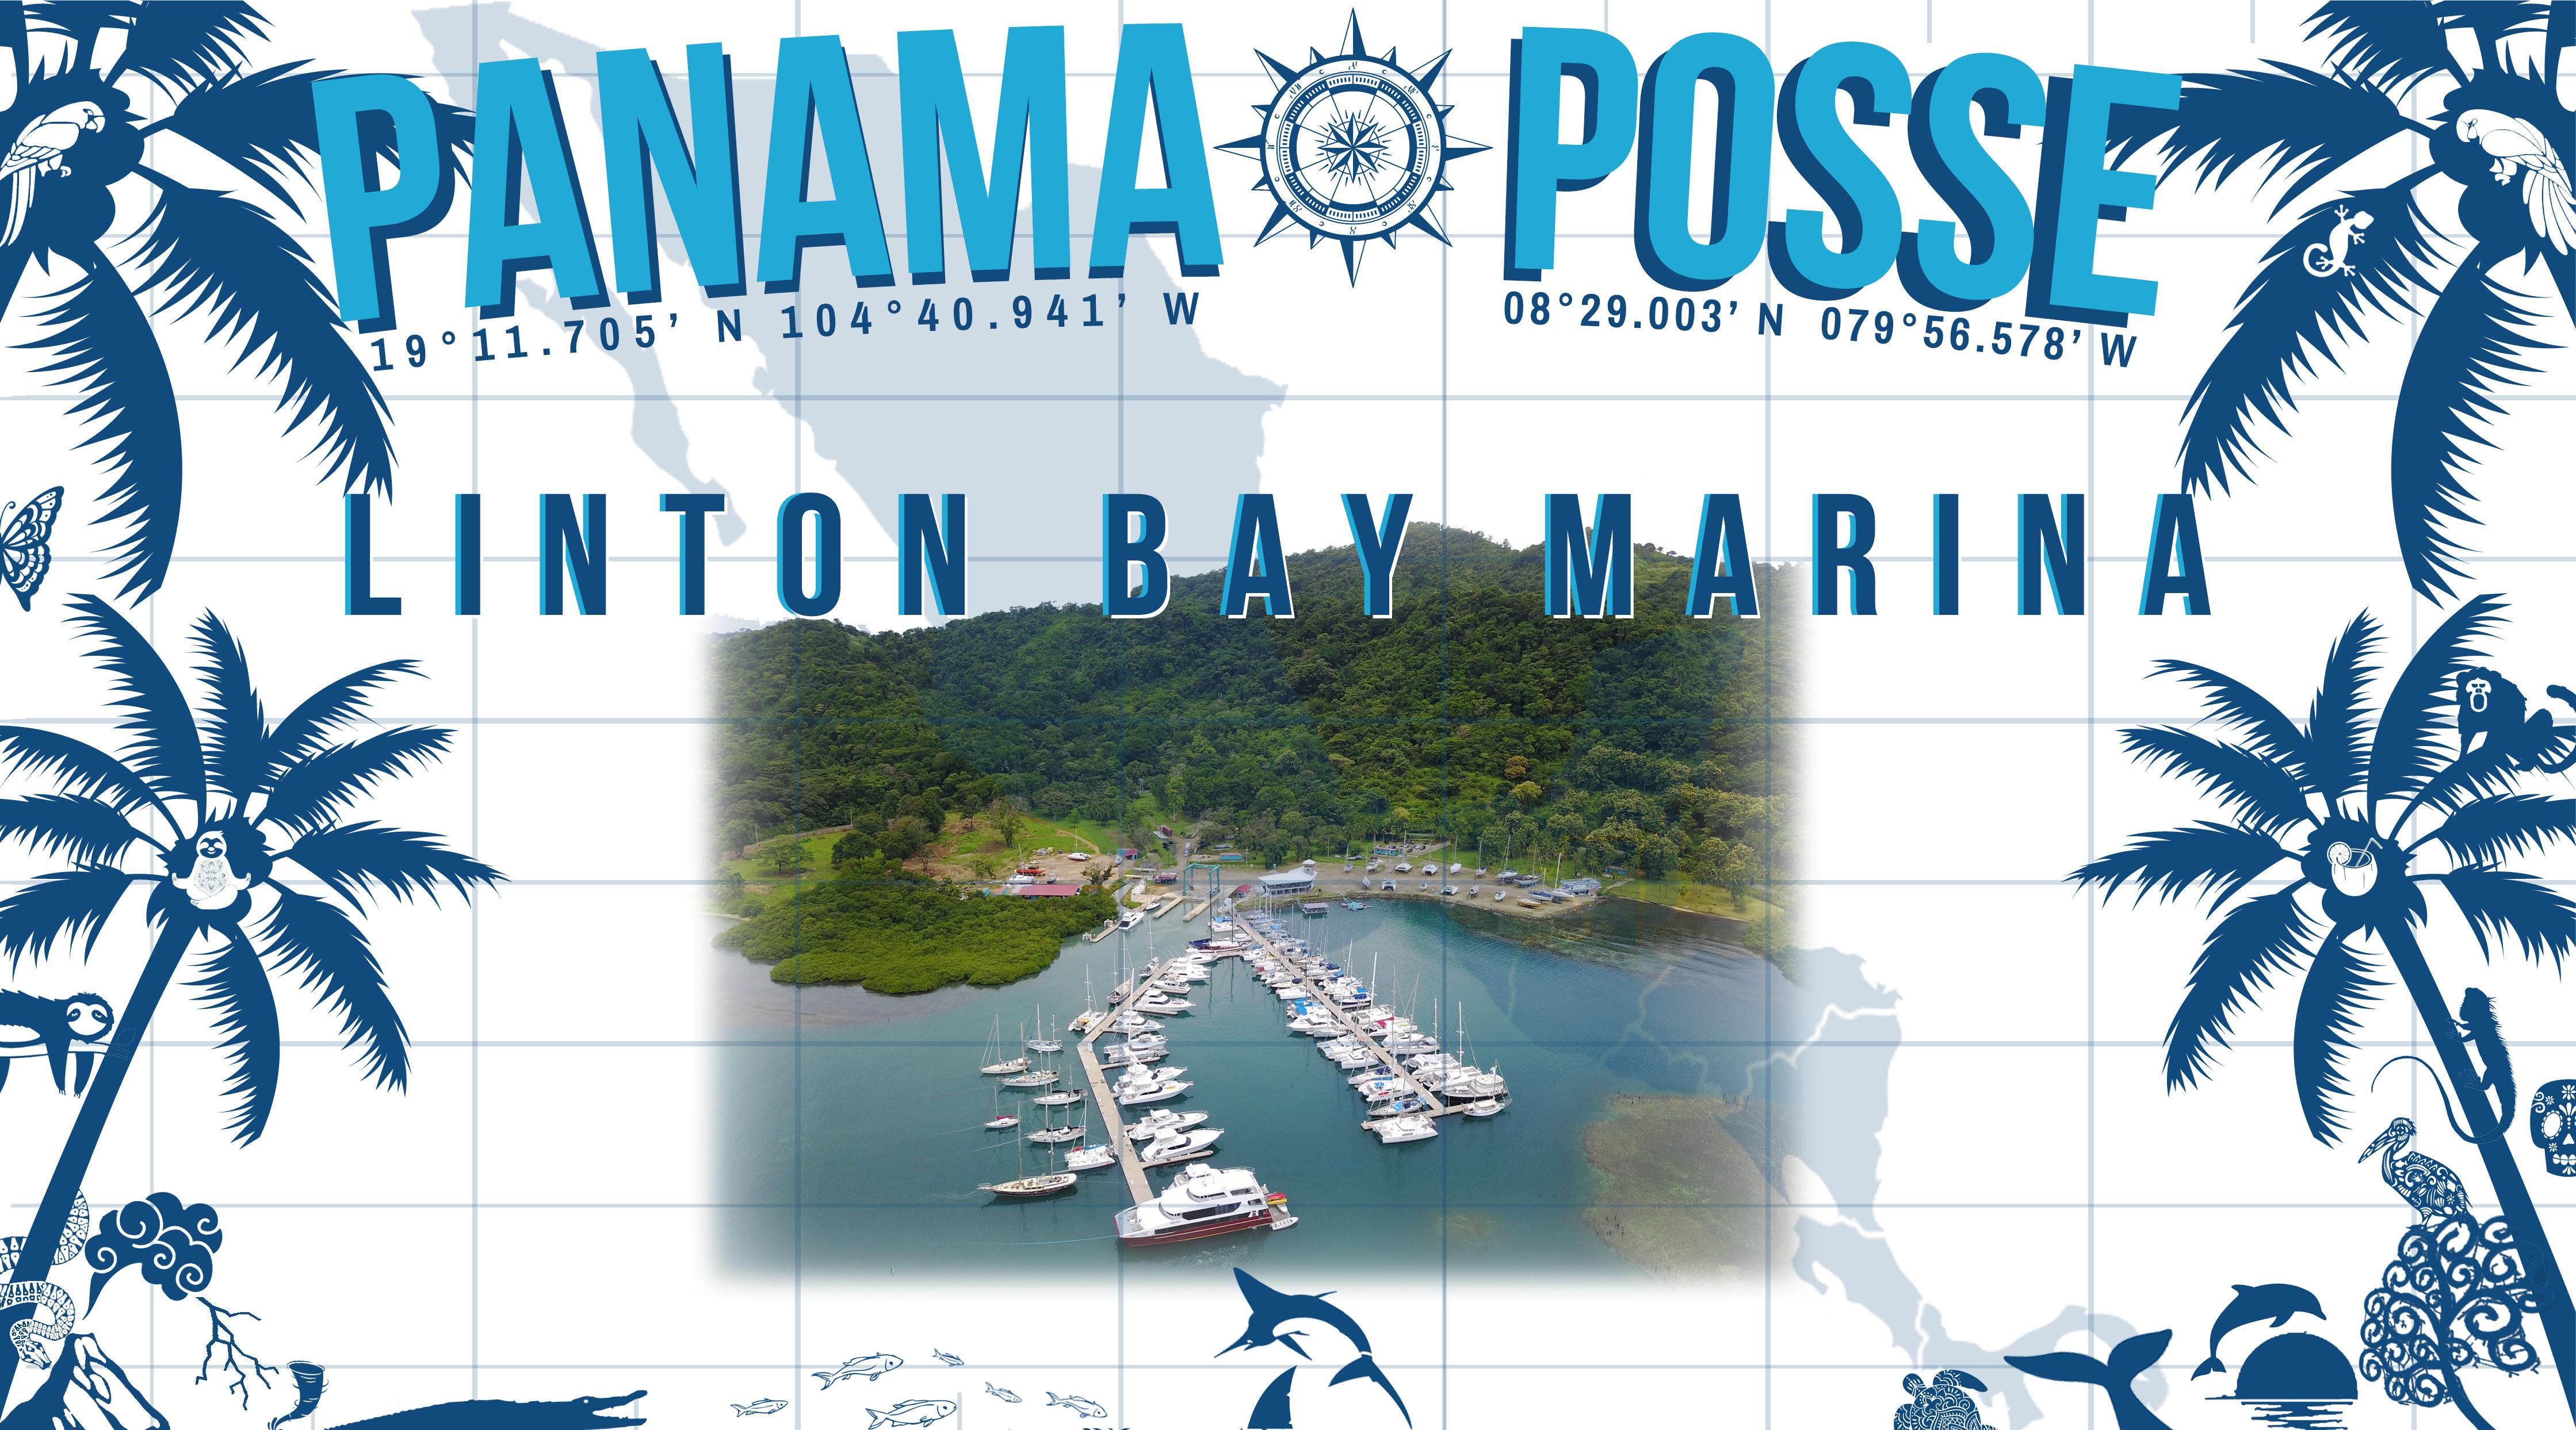 Kinton Bay Marina Sponsors the Panama Posse